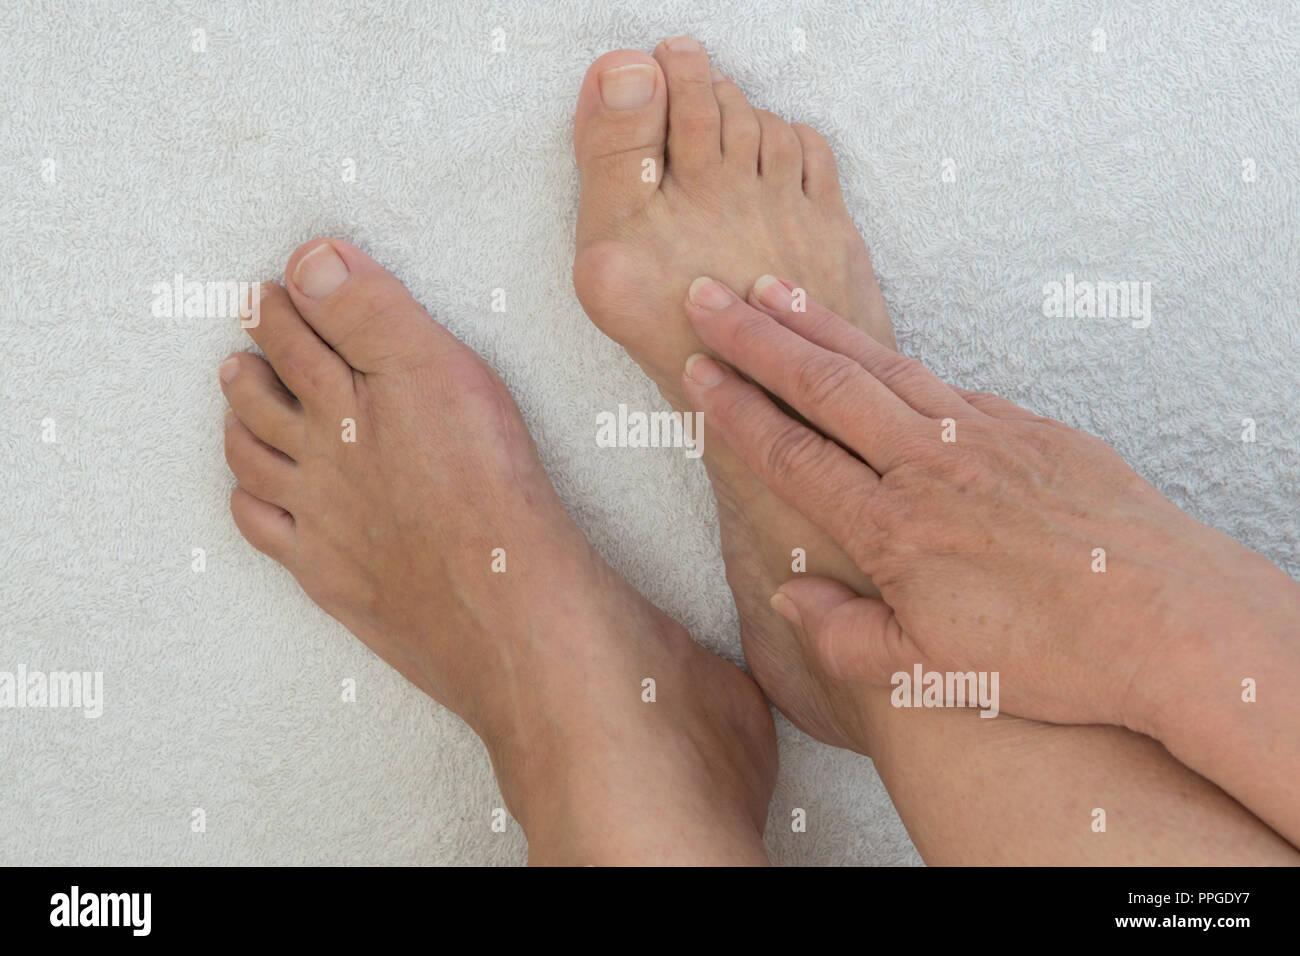 Joint Swelling Imágenes De Stock Joint Swelling Fotos De Stock Alamy